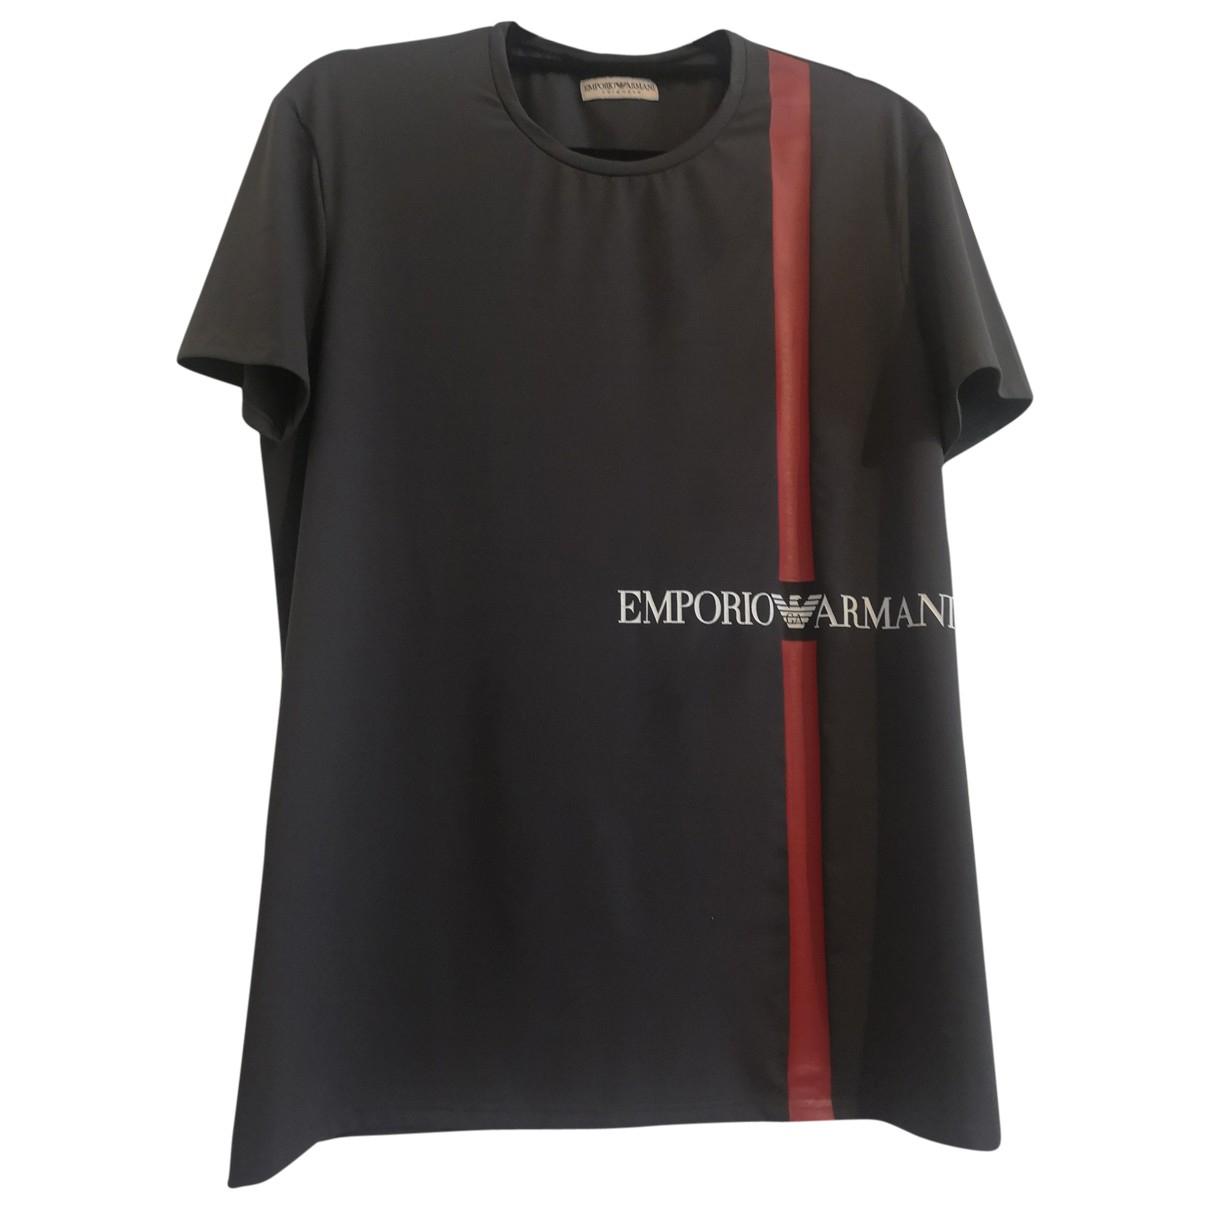 Emporio Armani \N T-Shirts in  Grau Polyester